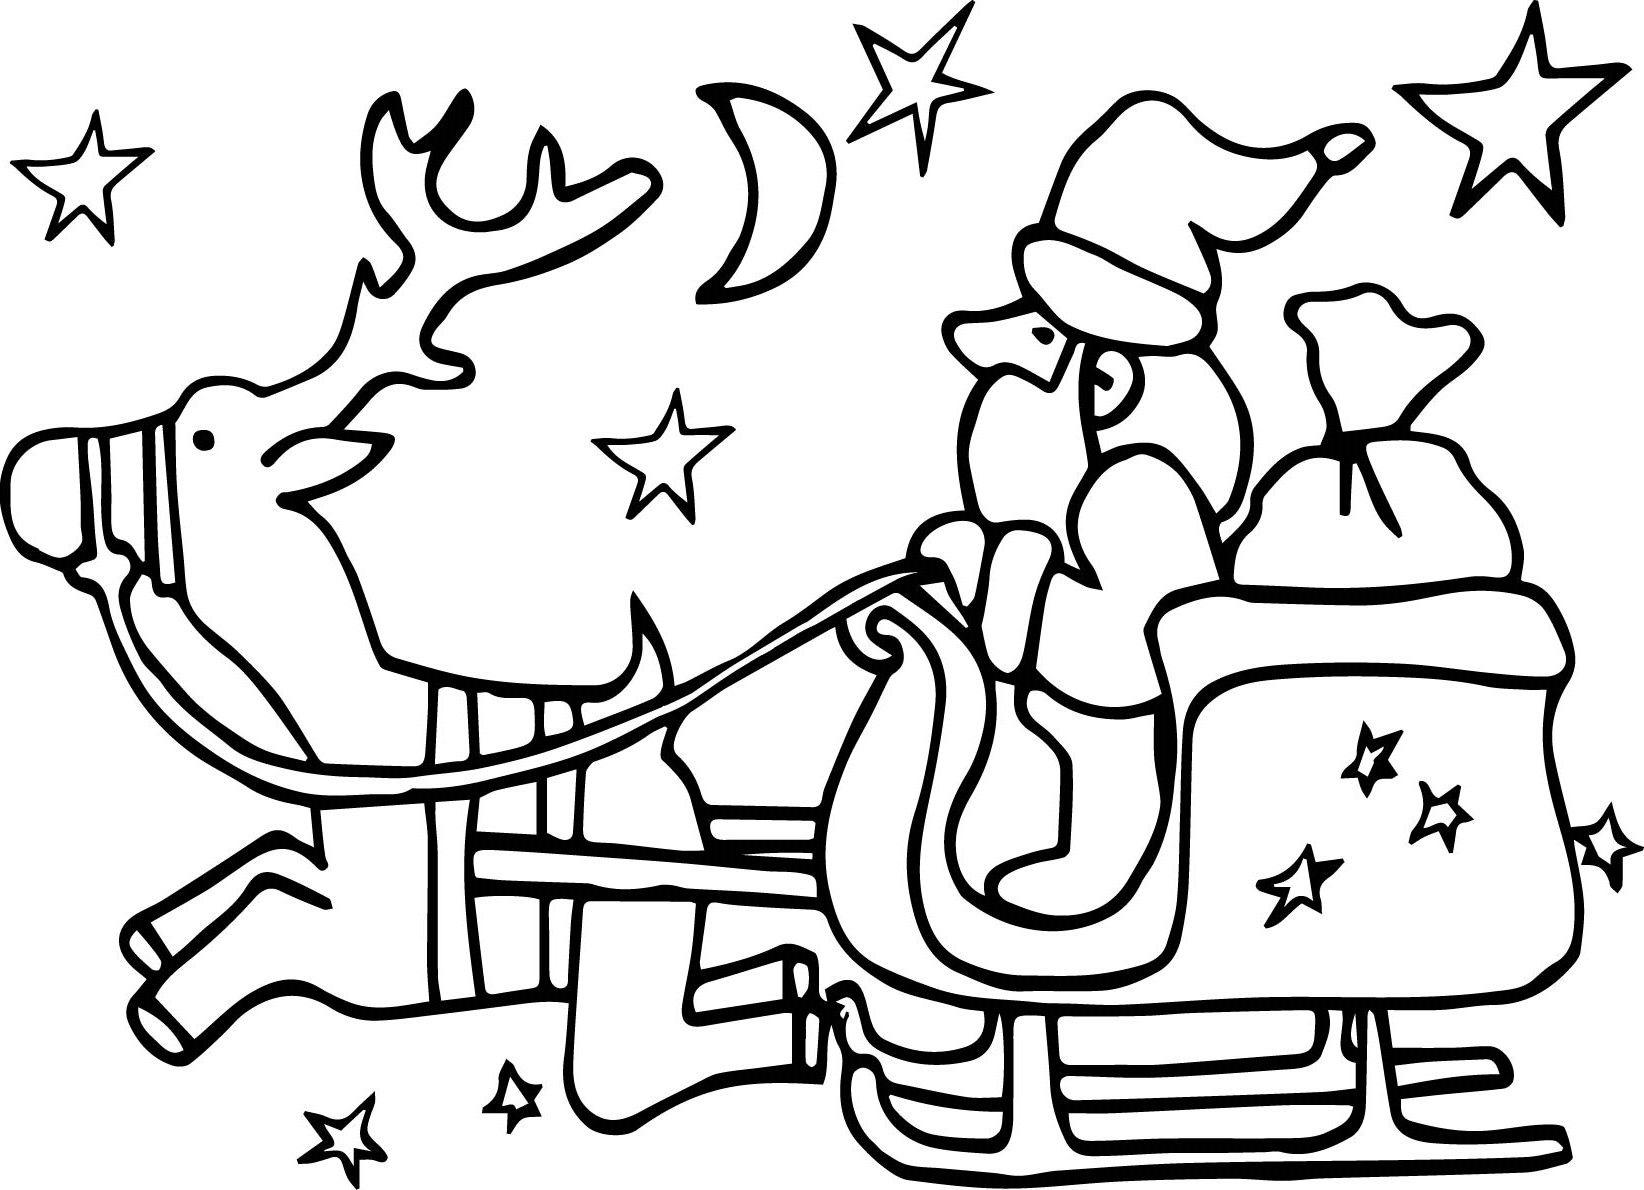 Yilbasi Noel Baba Ve Geyik Boyama Sayfasi Wallpaper Noel Baba